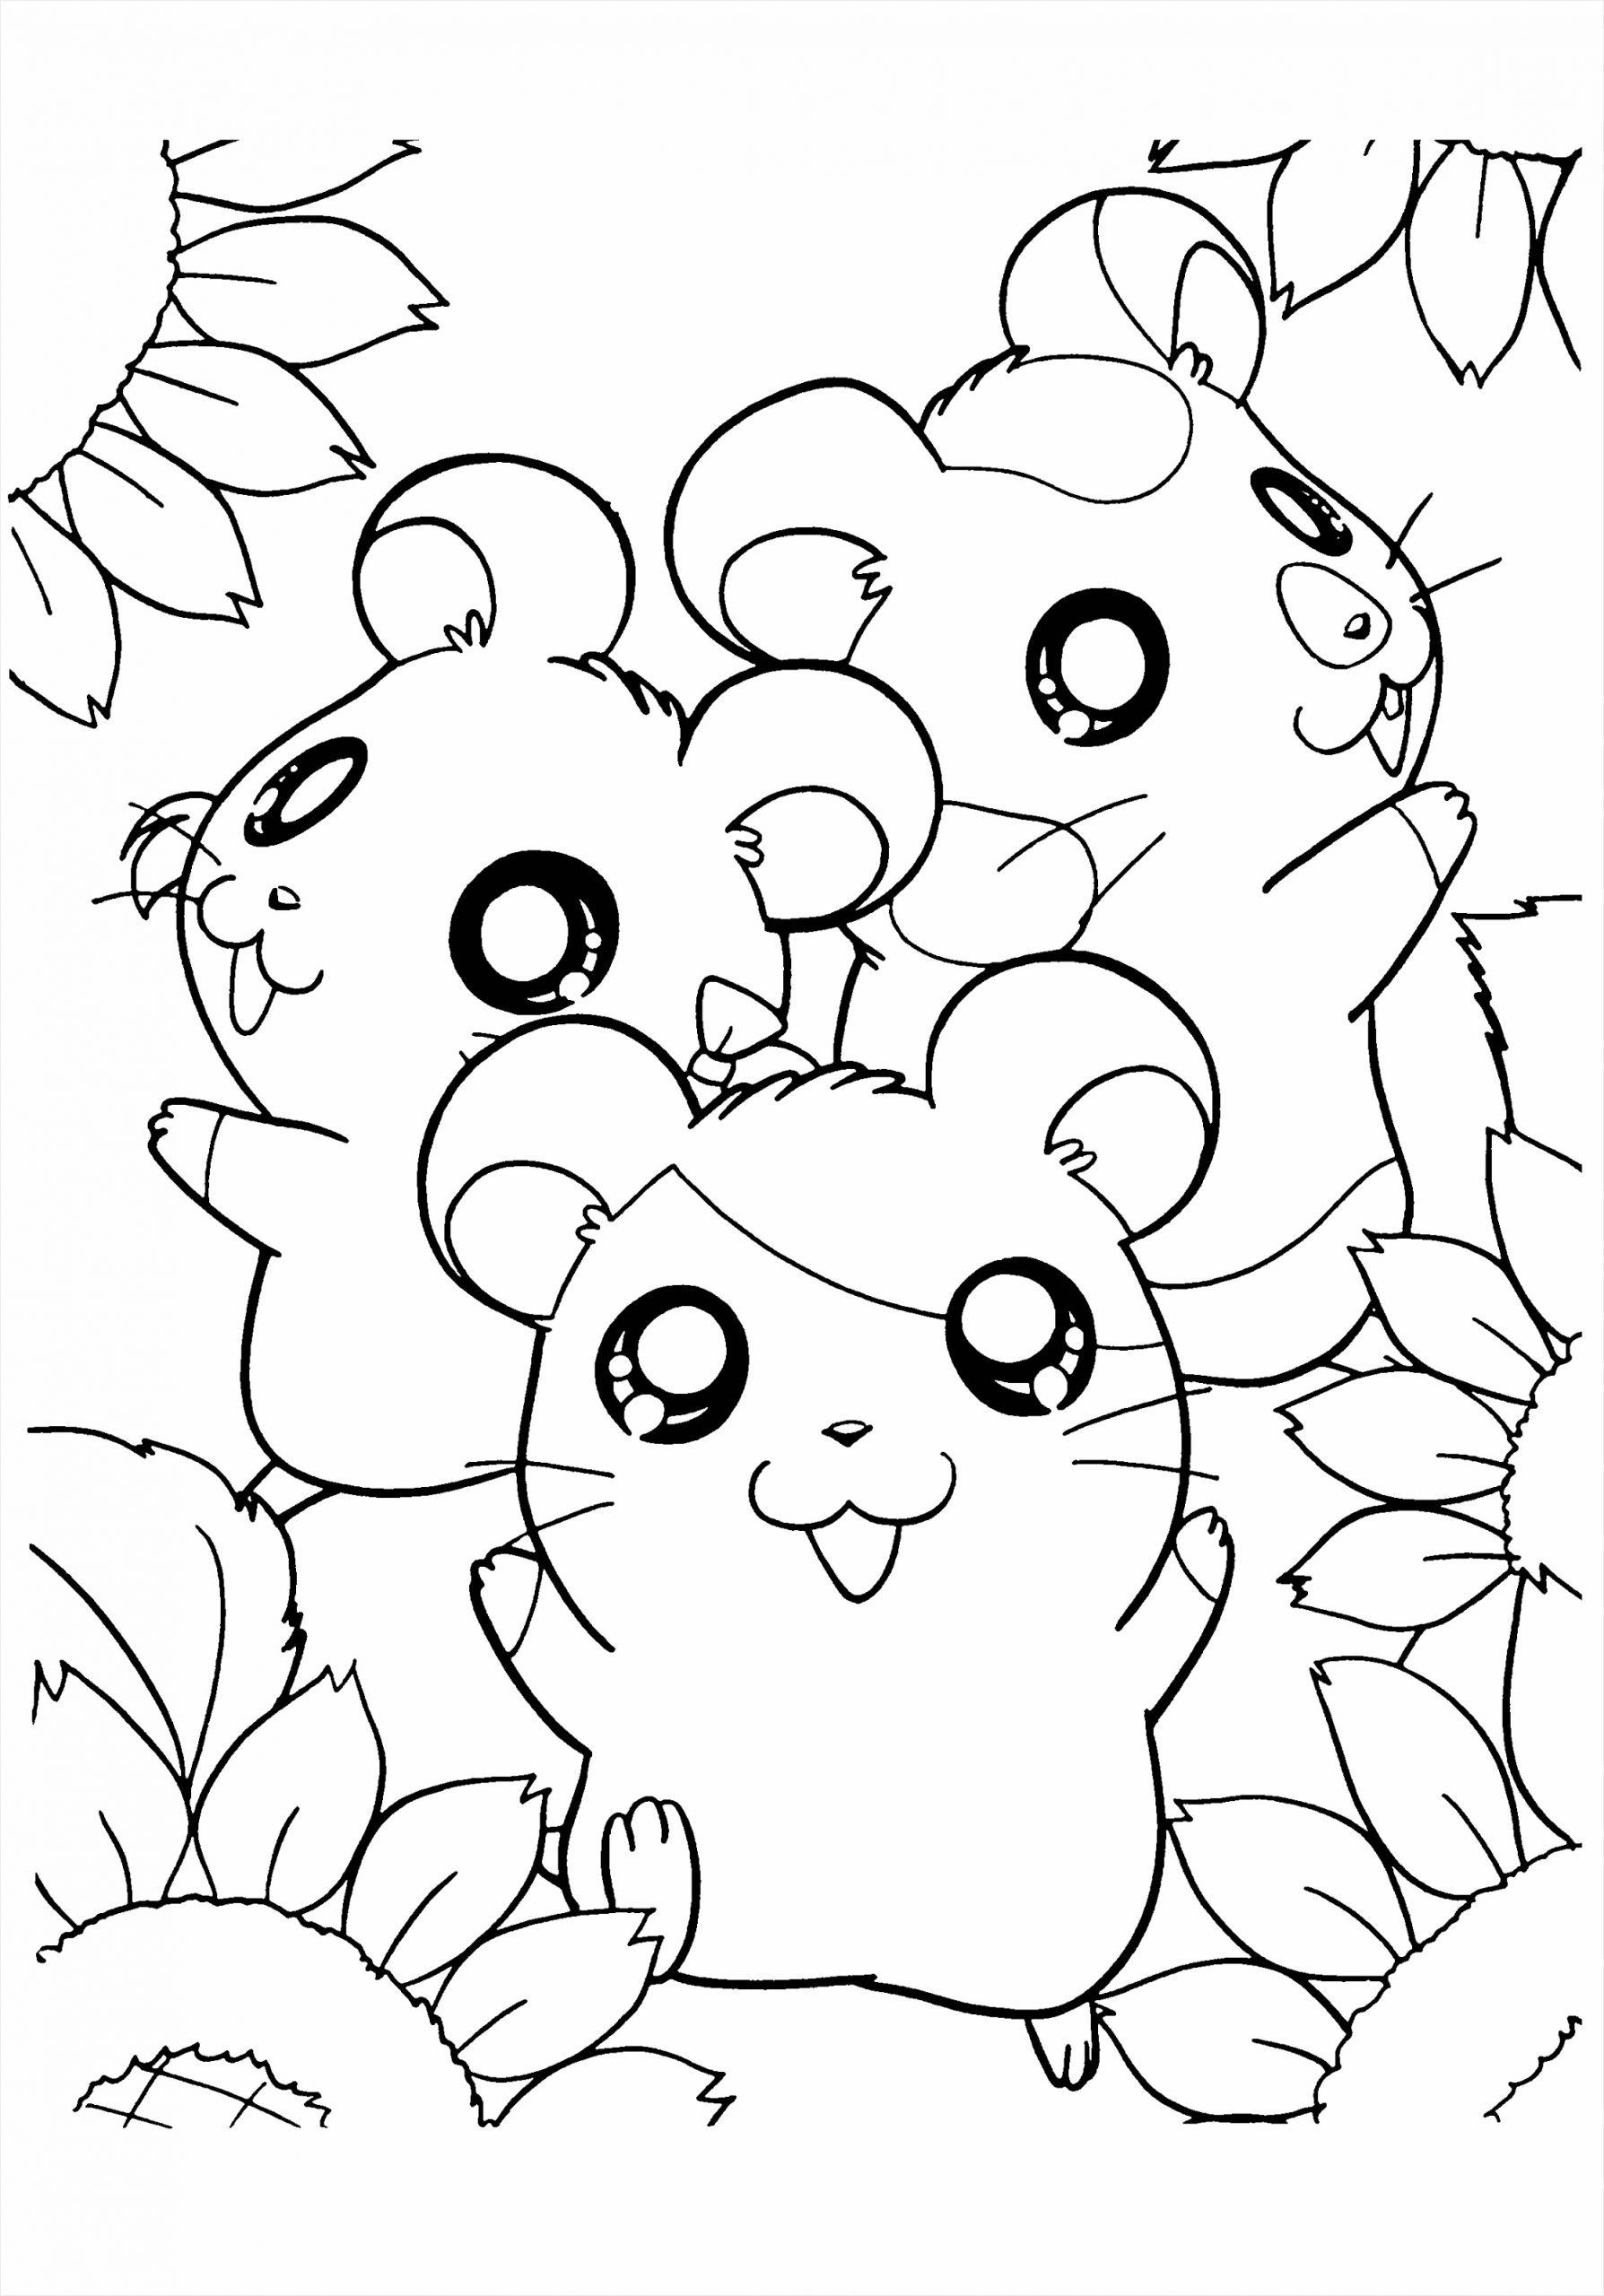 Cute Girl Hamster Coloring Pages az hamtaro coloring pages coloring home Pages Girl Cute Coloring Hamster optyu